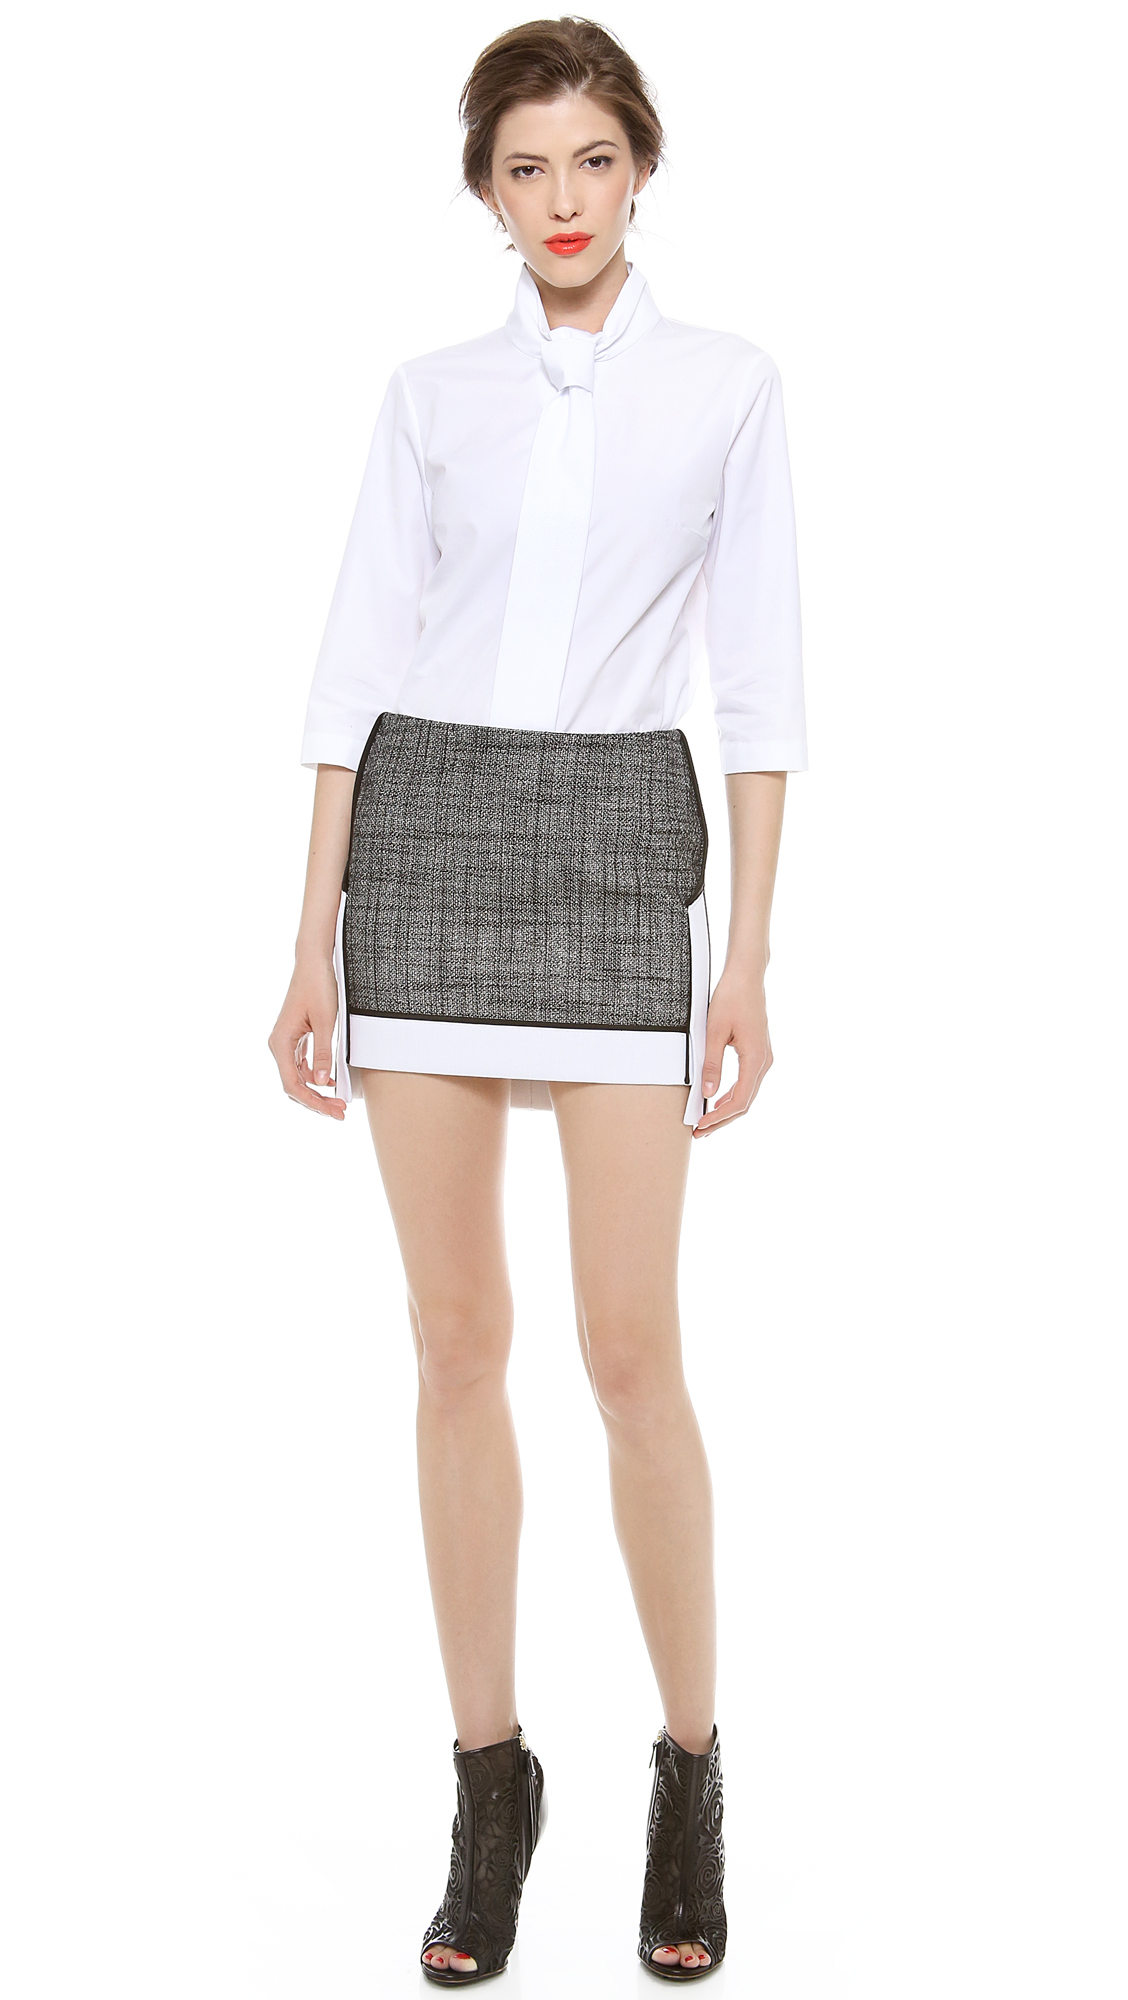 viktor rolf tie detail blouse in white lyst. Black Bedroom Furniture Sets. Home Design Ideas